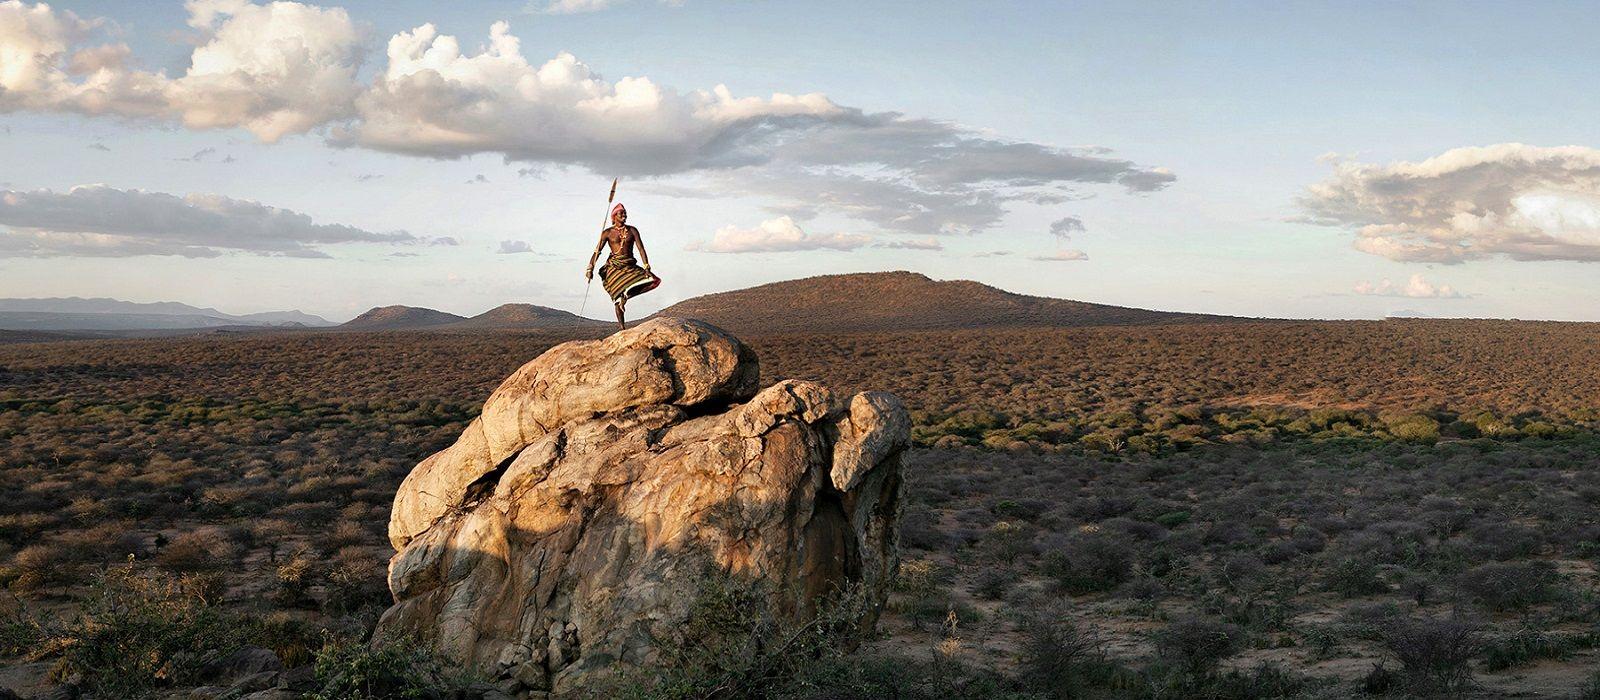 Kenia und Tansania: Kamel Trekking und Strandurlaub Urlaub 3